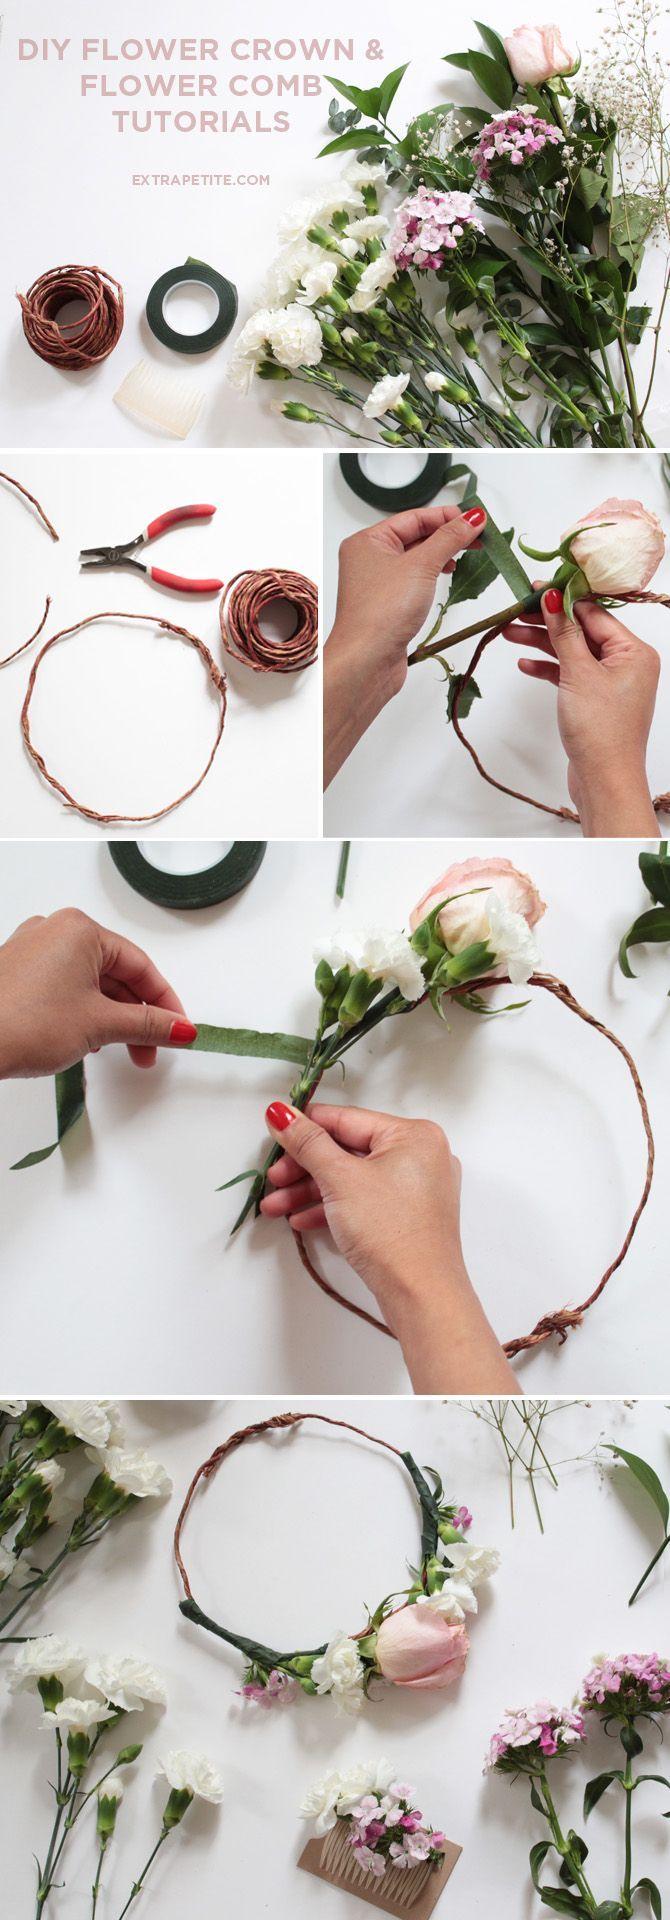 Flower crown comb diy tutorial bridal shower activity diy flower crown comb diy tutorial bridal shower activity izmirmasajfo